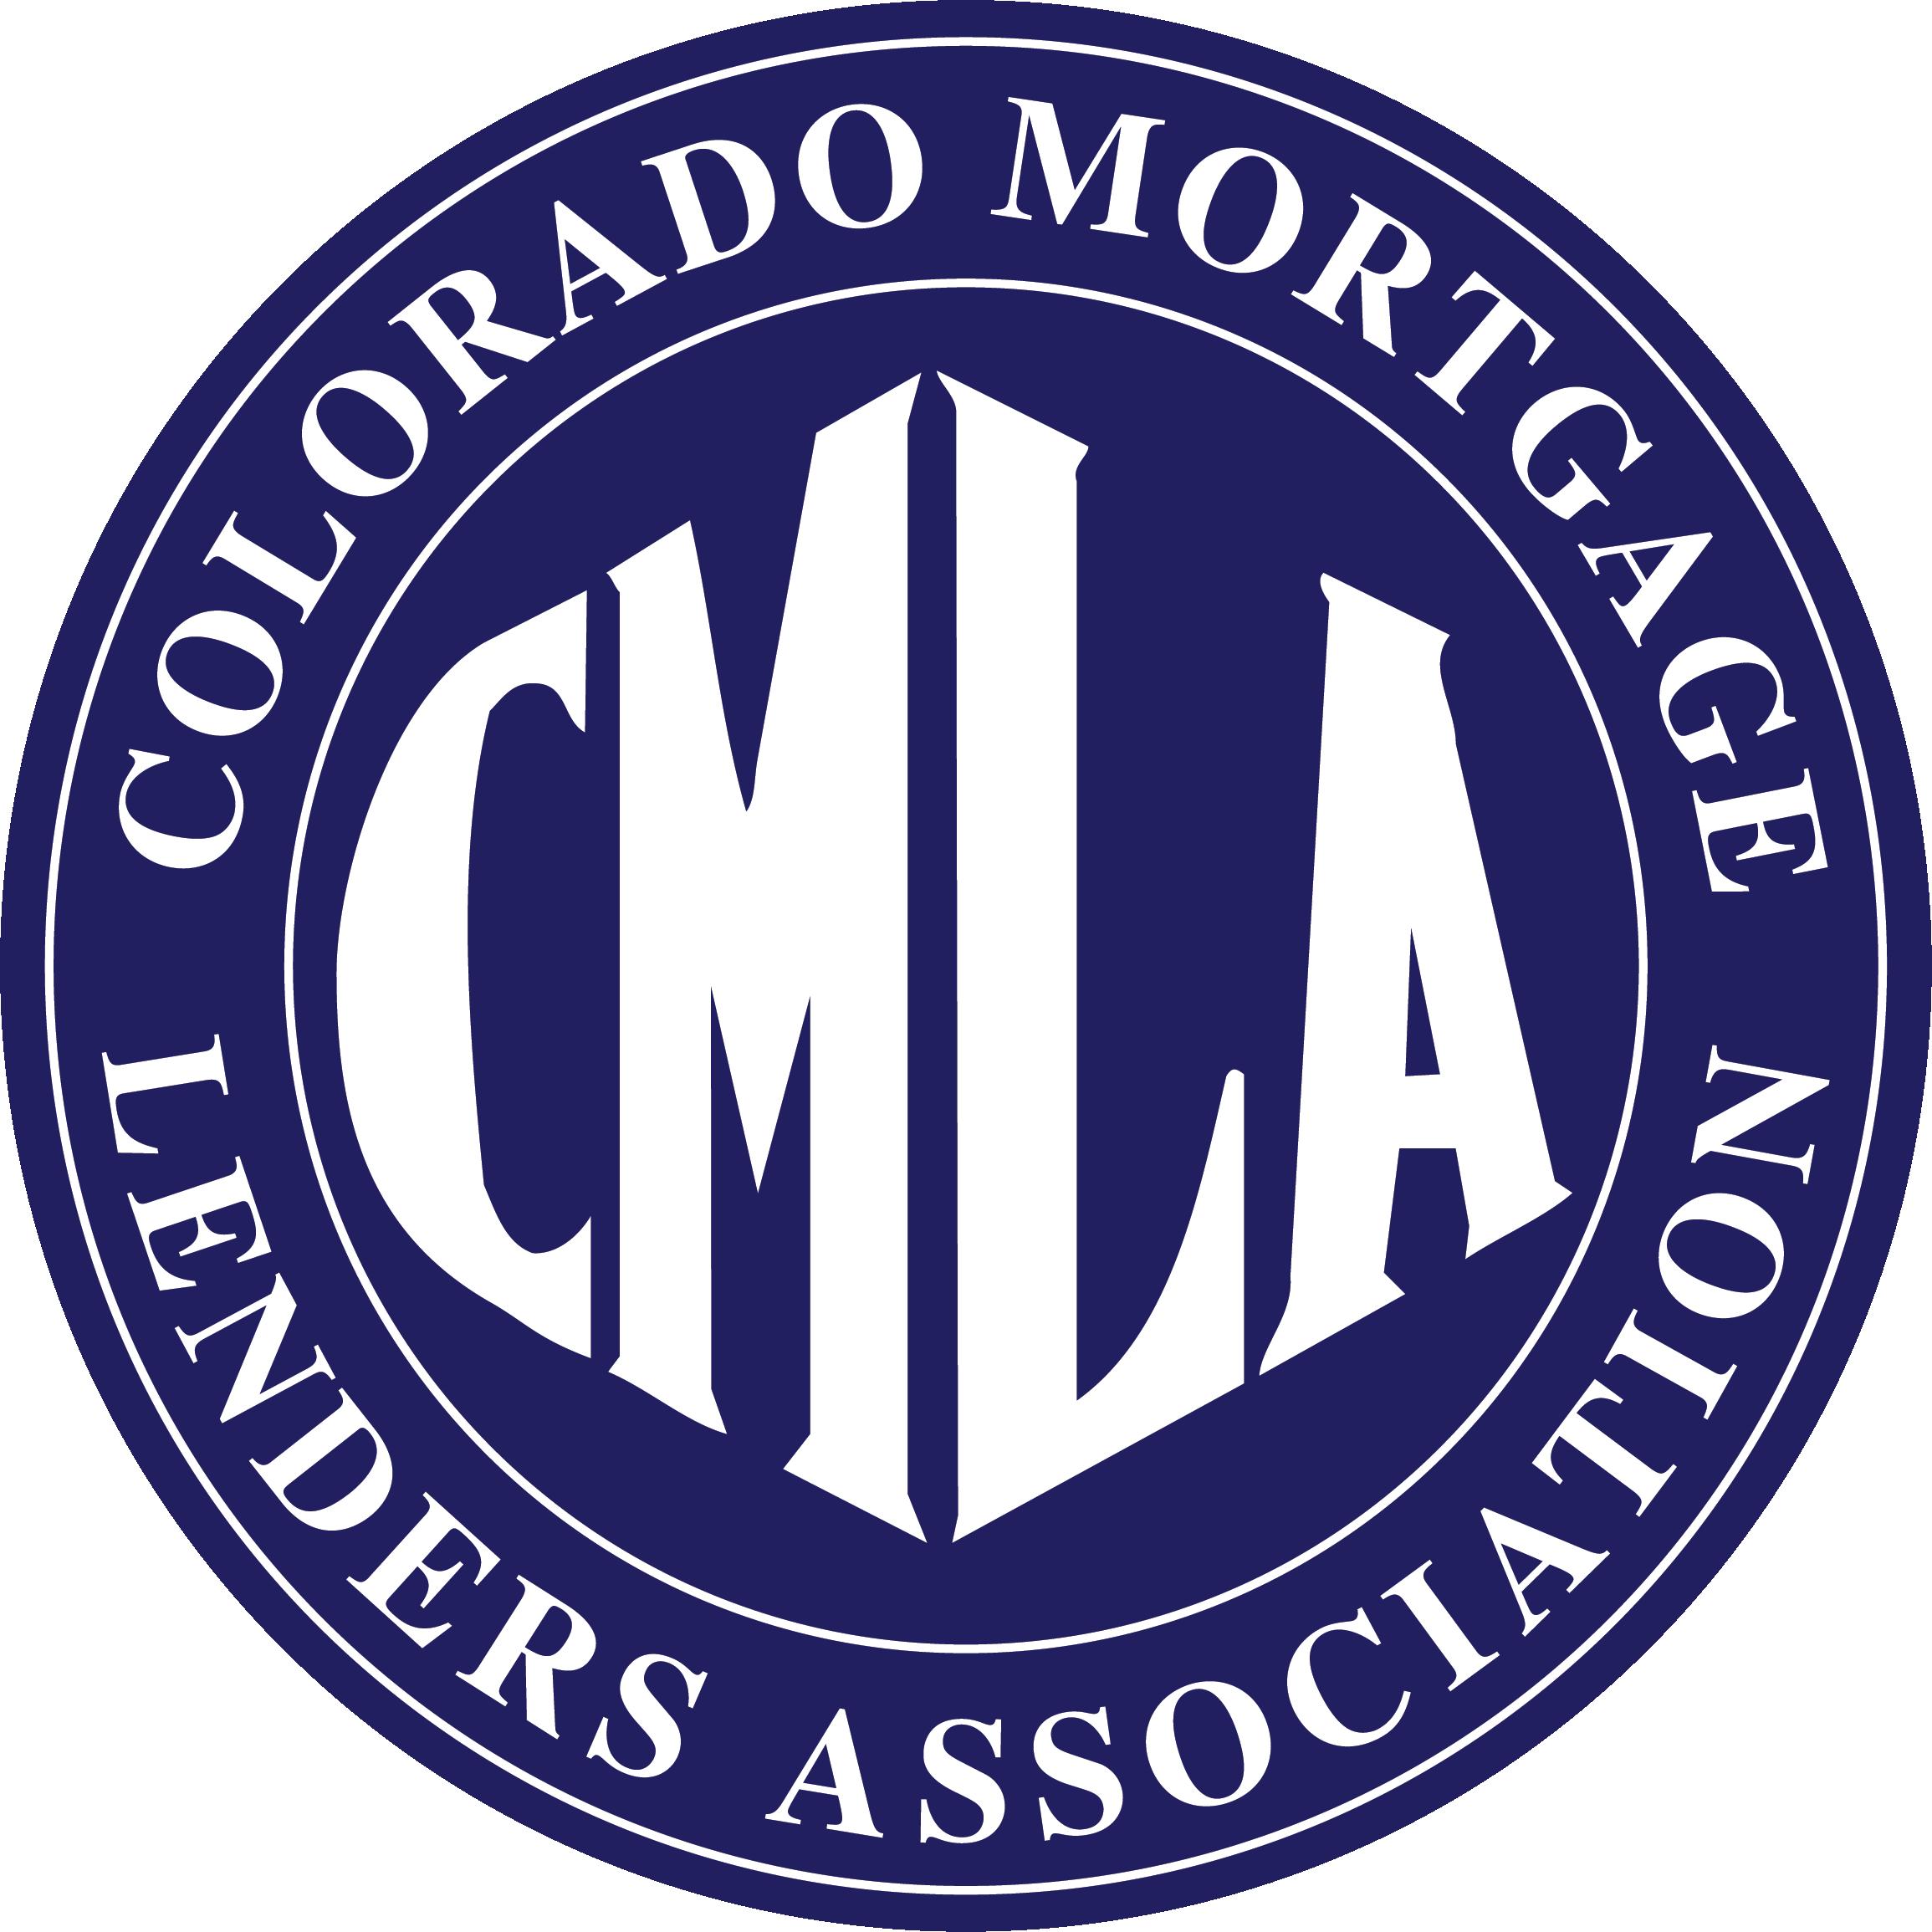 2019 CMLA Golf Classic logo